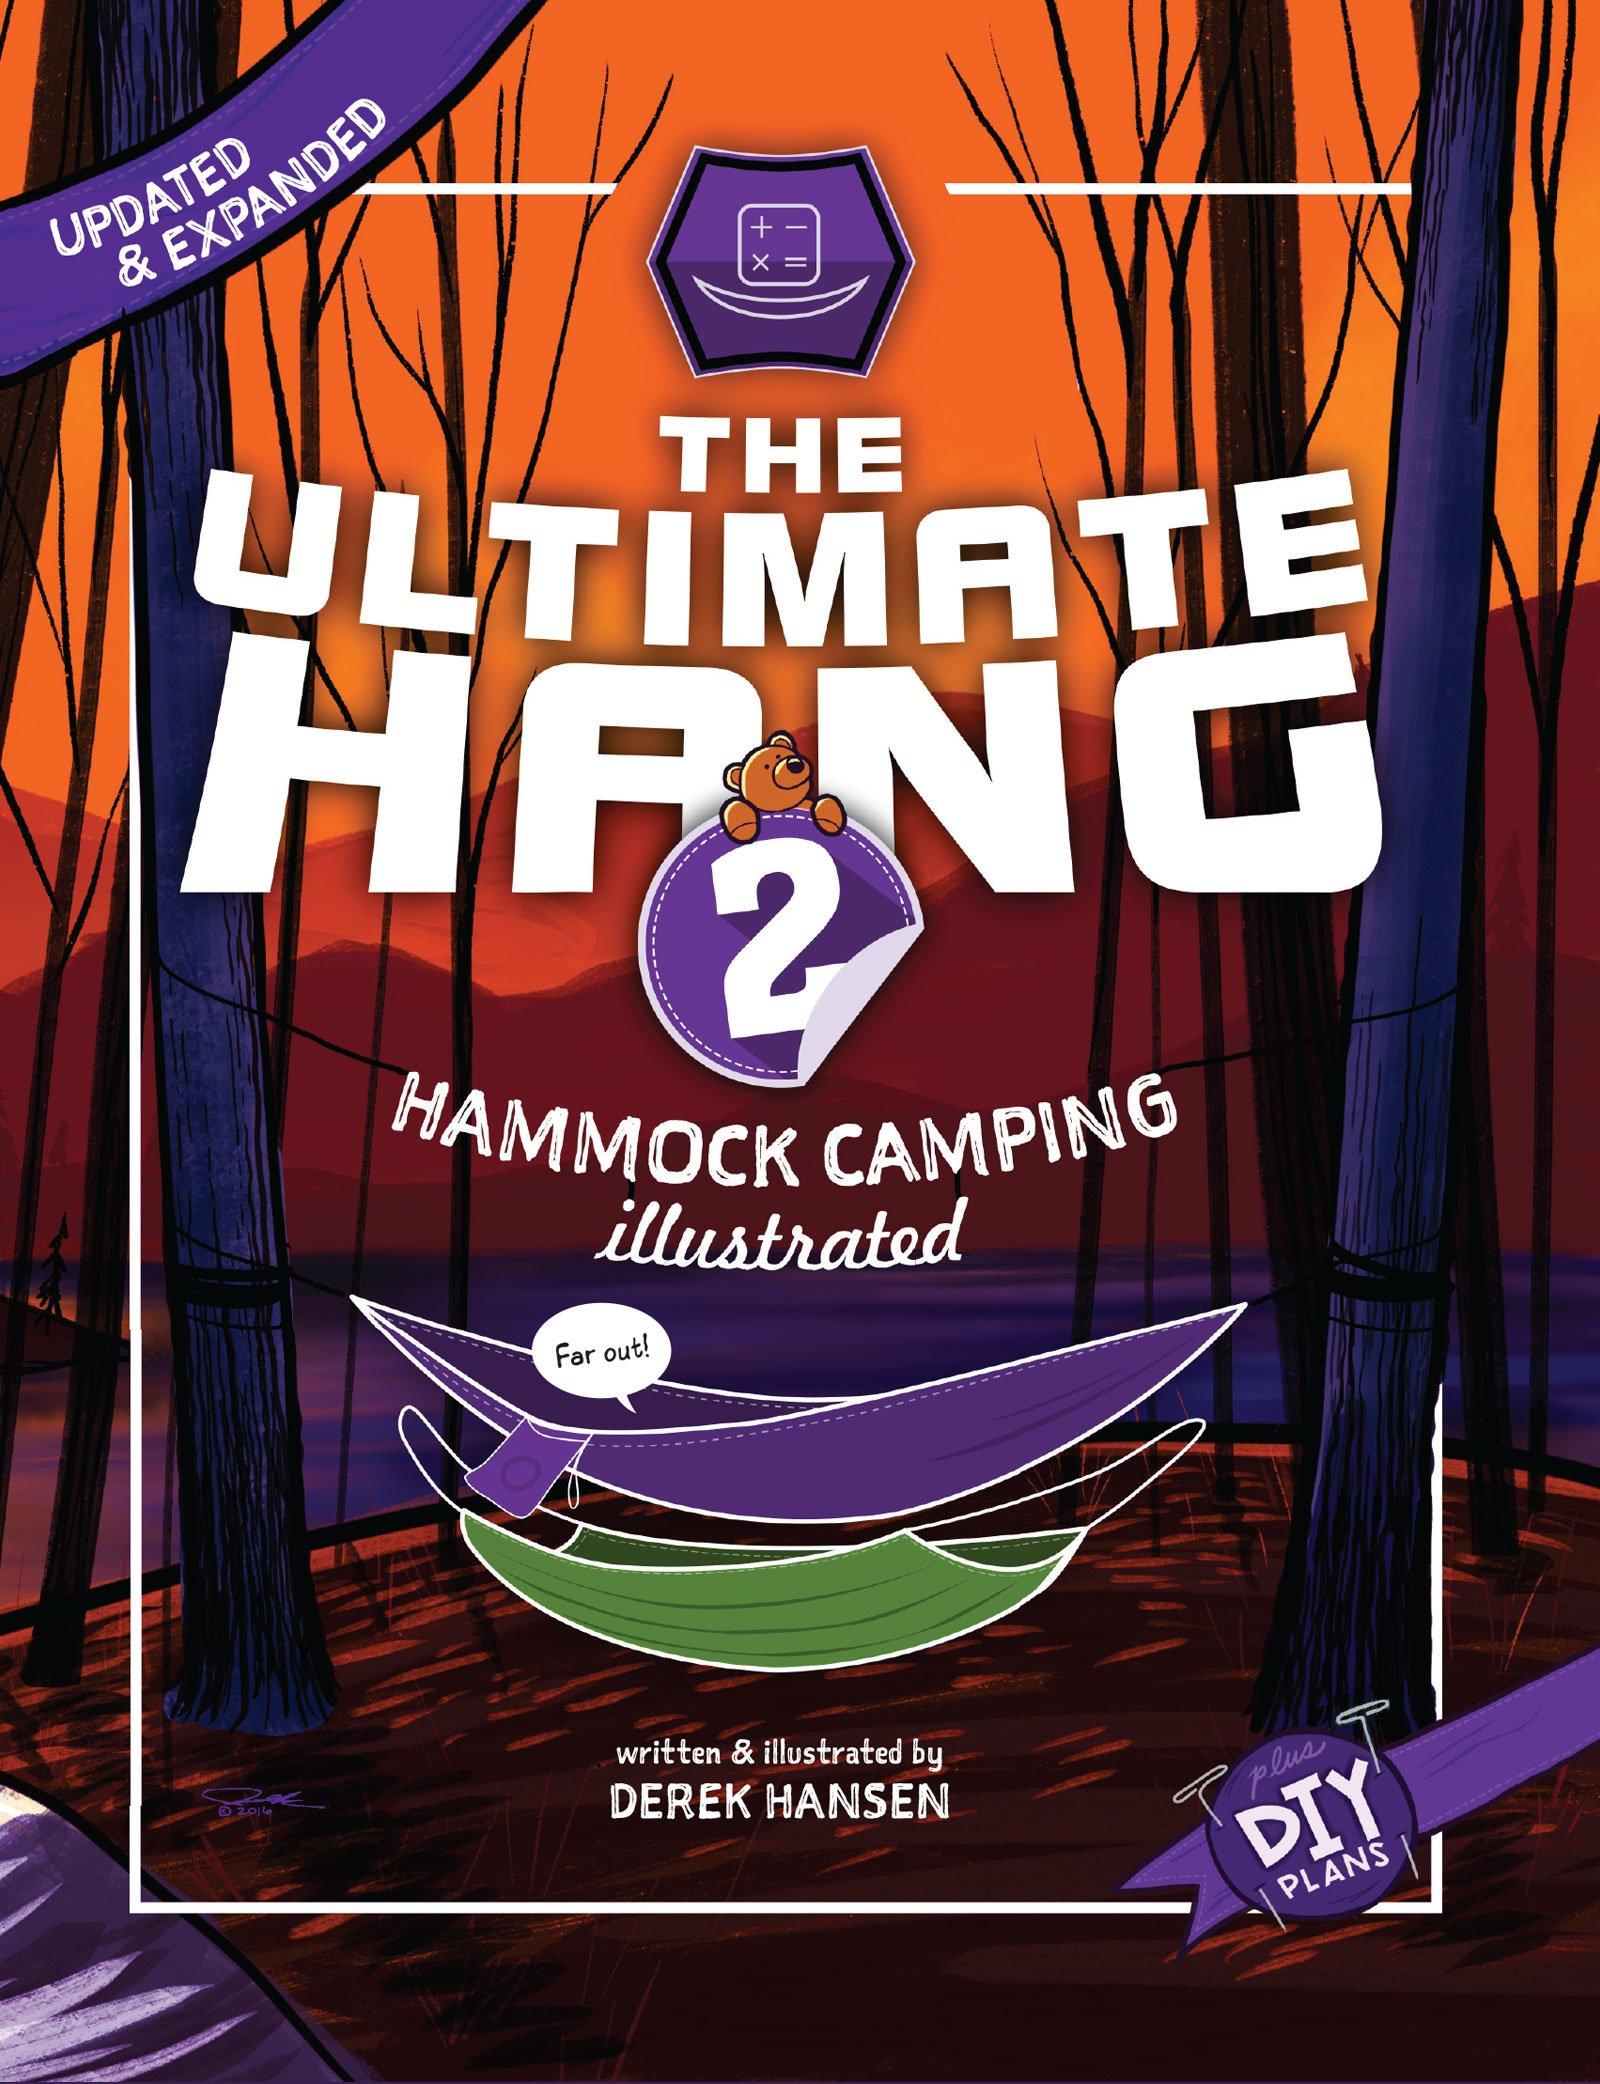 The Ultimate Hang  Hammock Camping Illustrated  English Edition